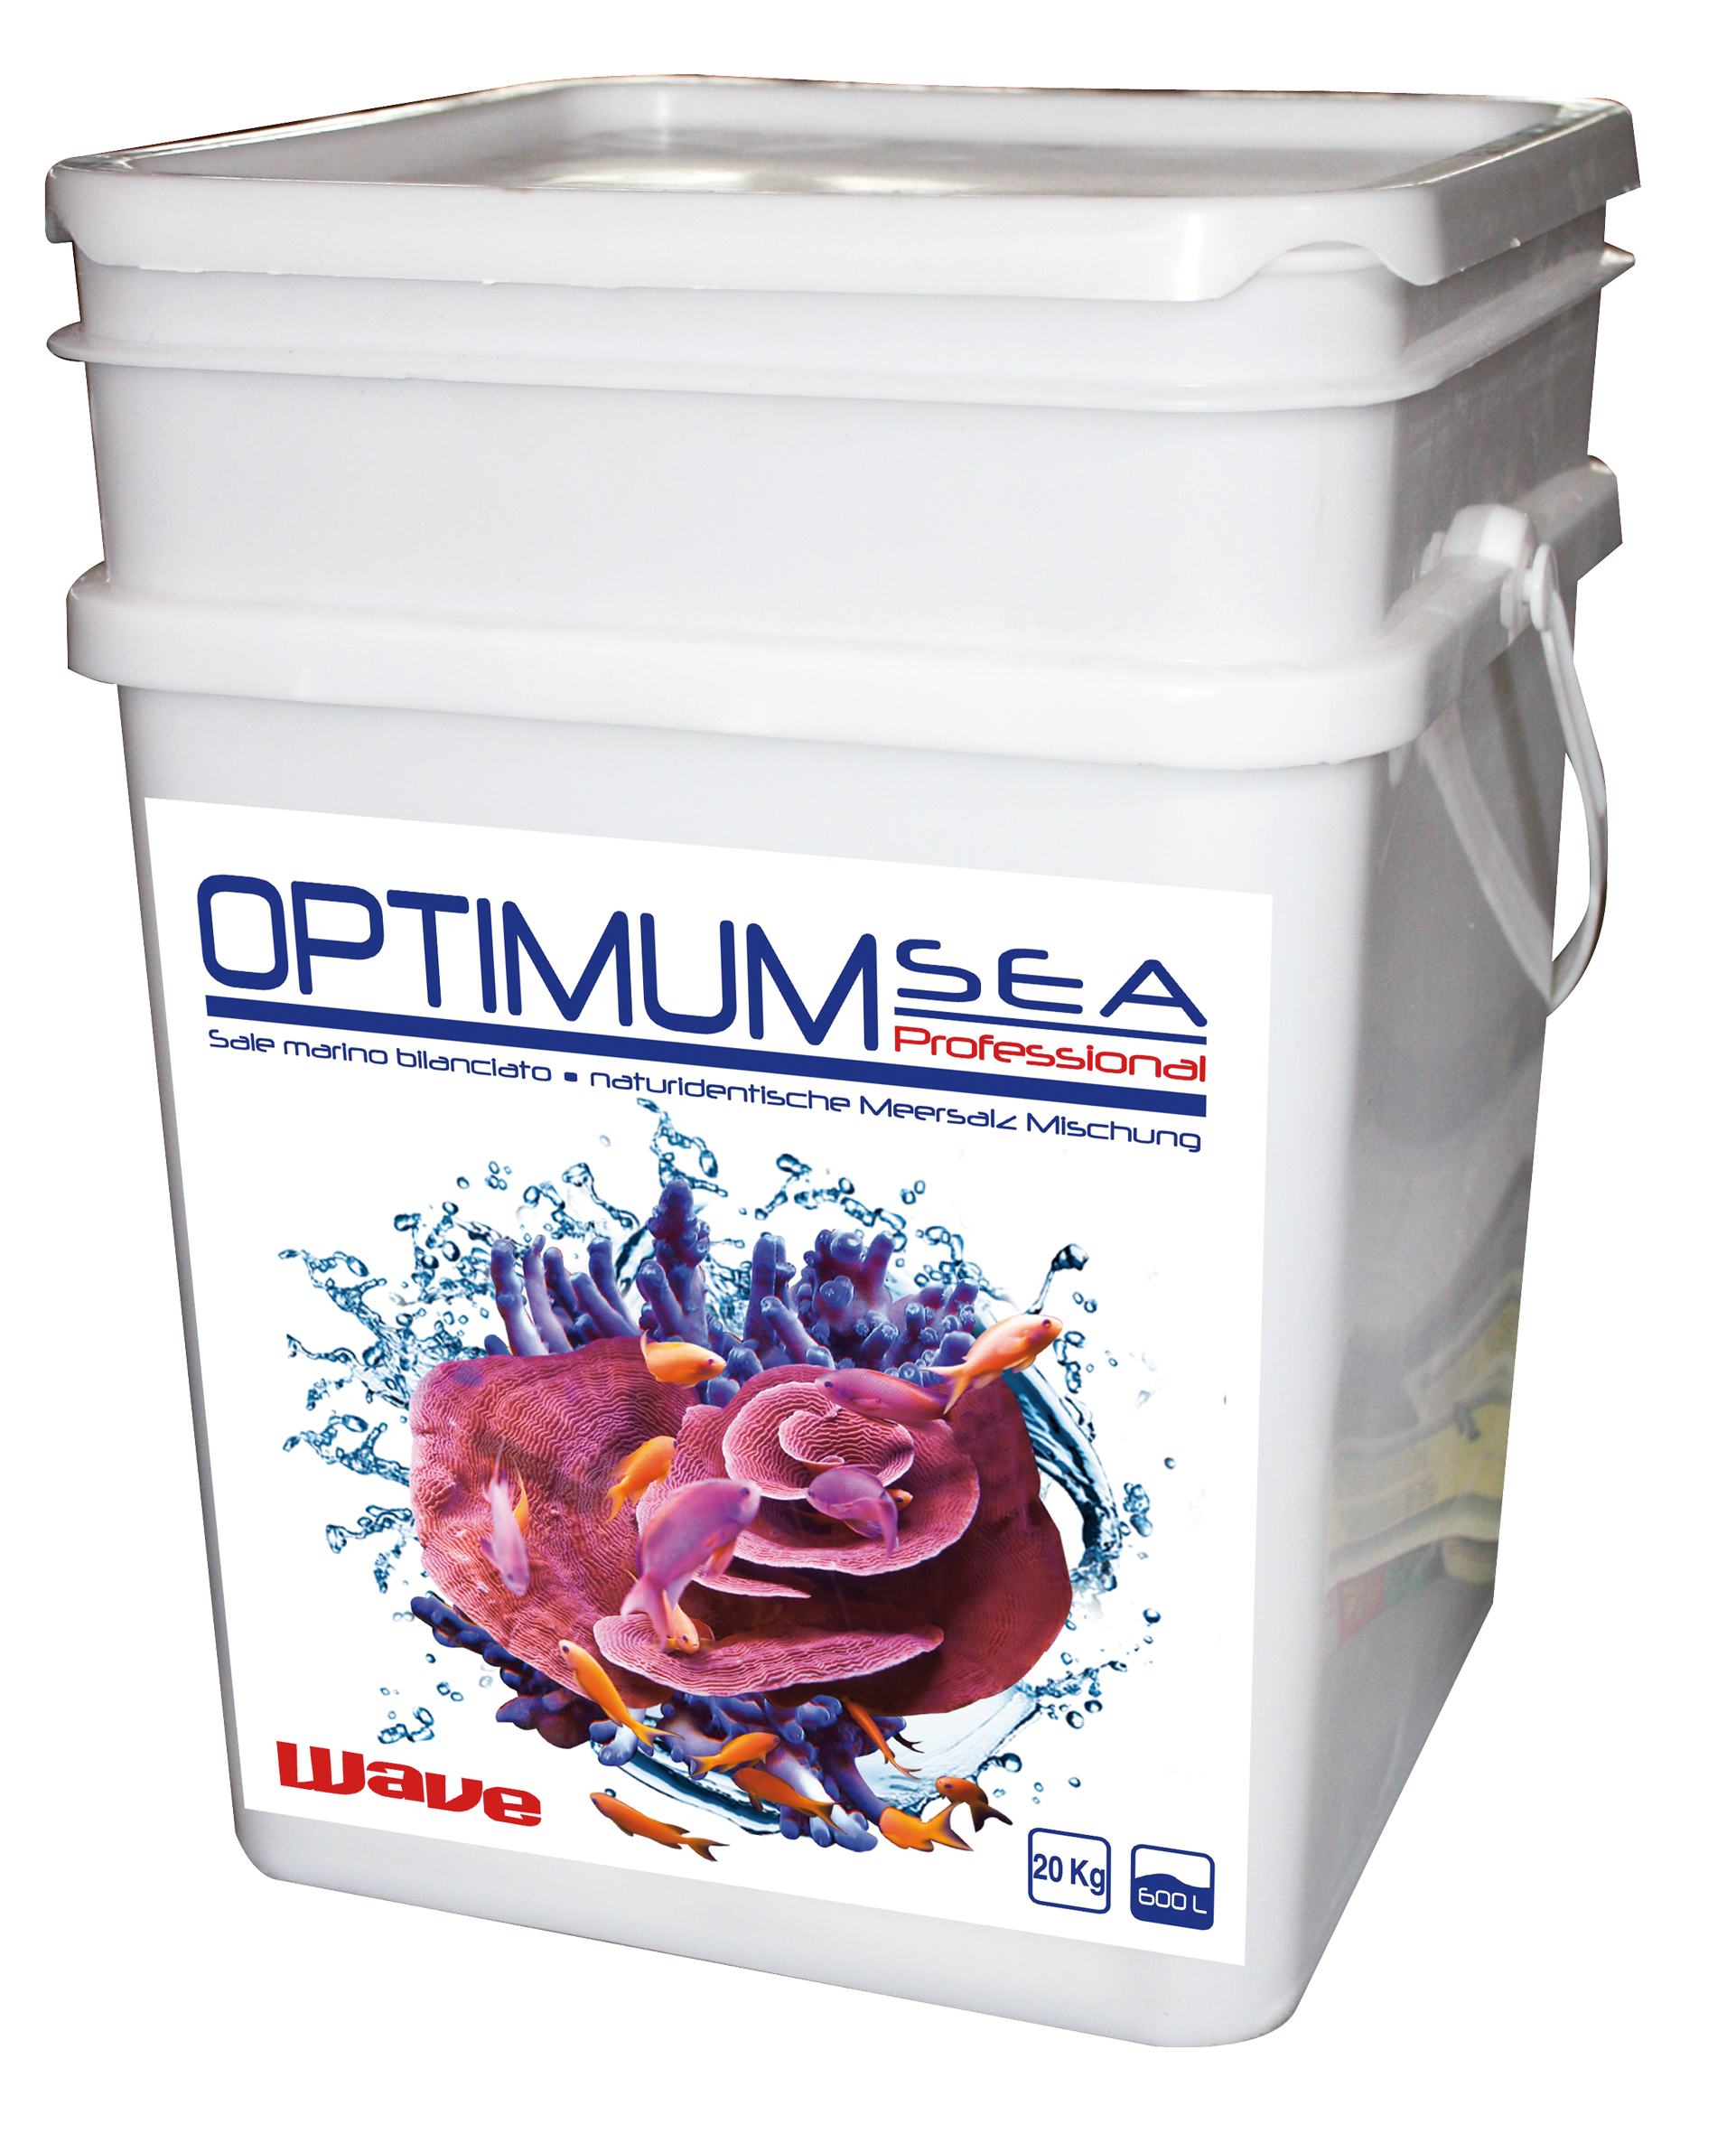 "Соль д/морск. аквариумов Wave ""Optimum Sea Professional"", 20 кг, на 600 л от Ravta"